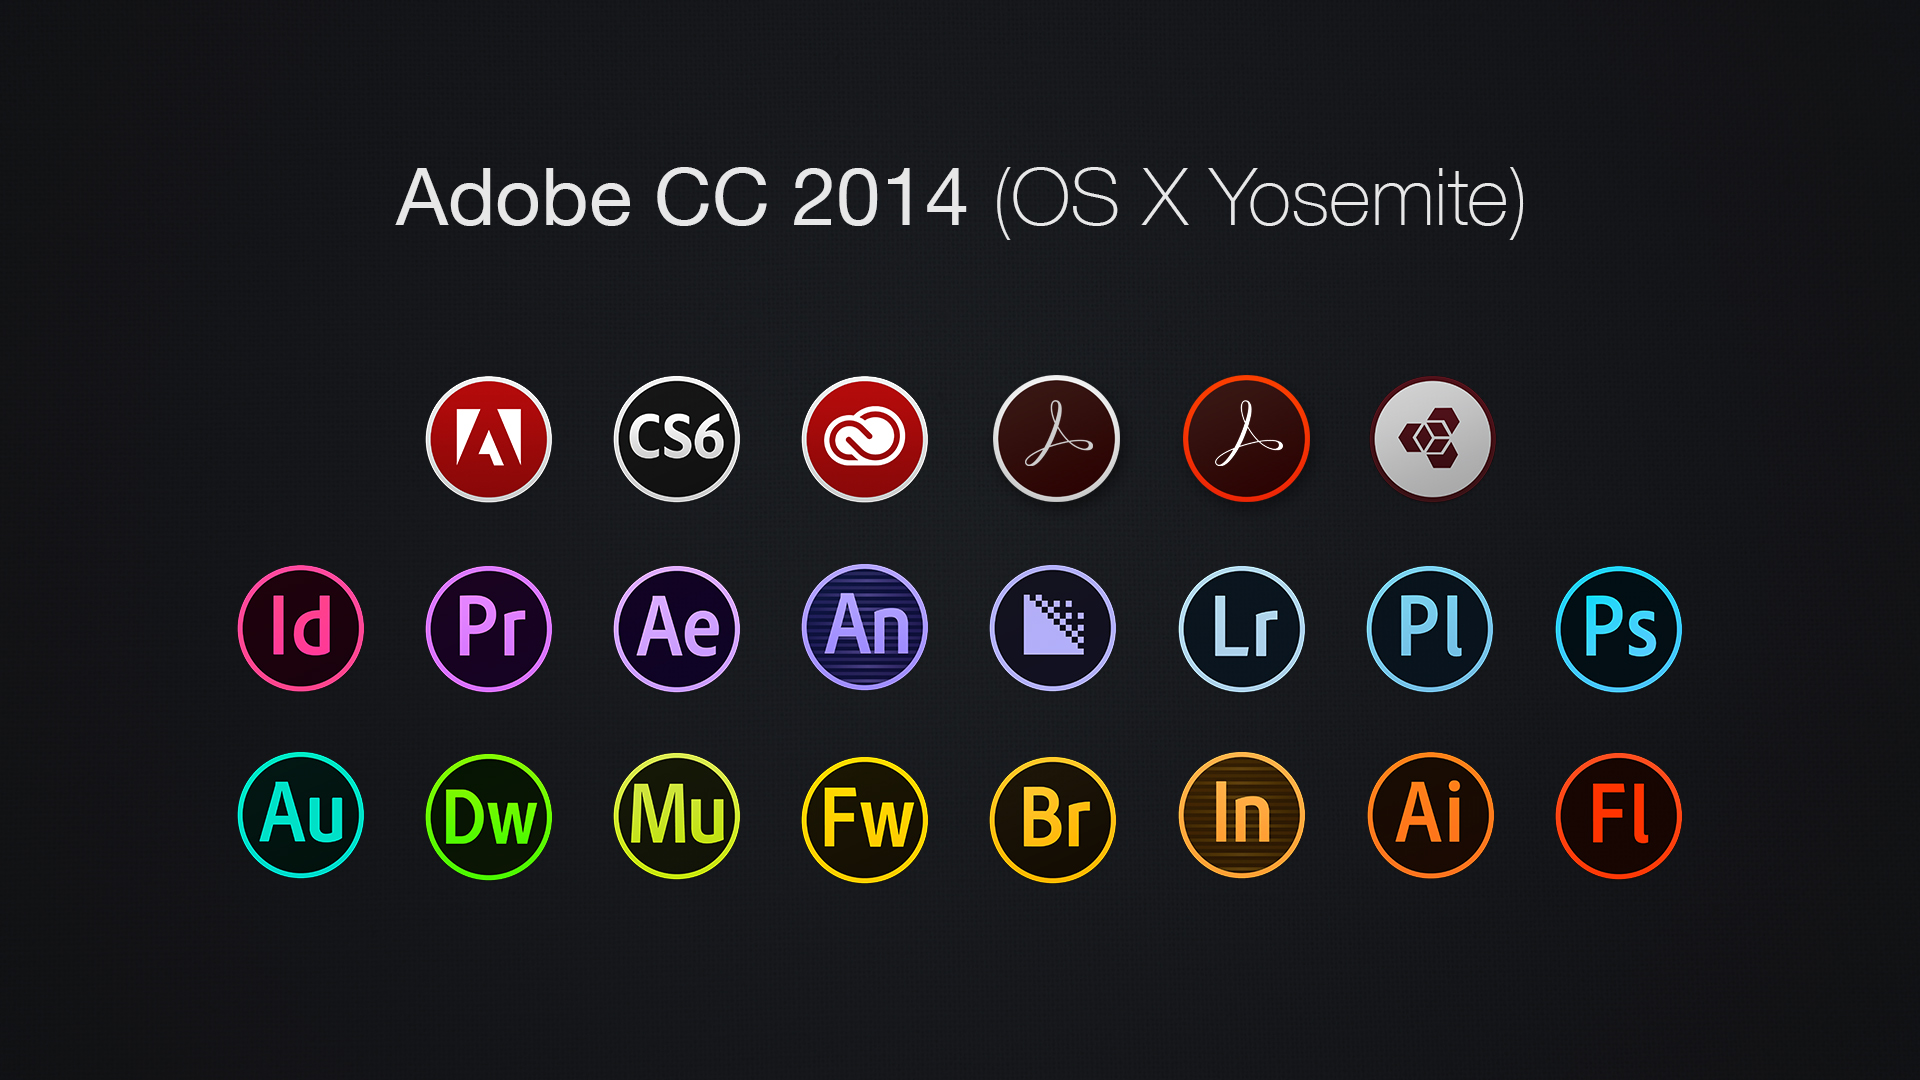 Adobe Indesign Icon Cs6 Adobe CC 2014 Icons (O...